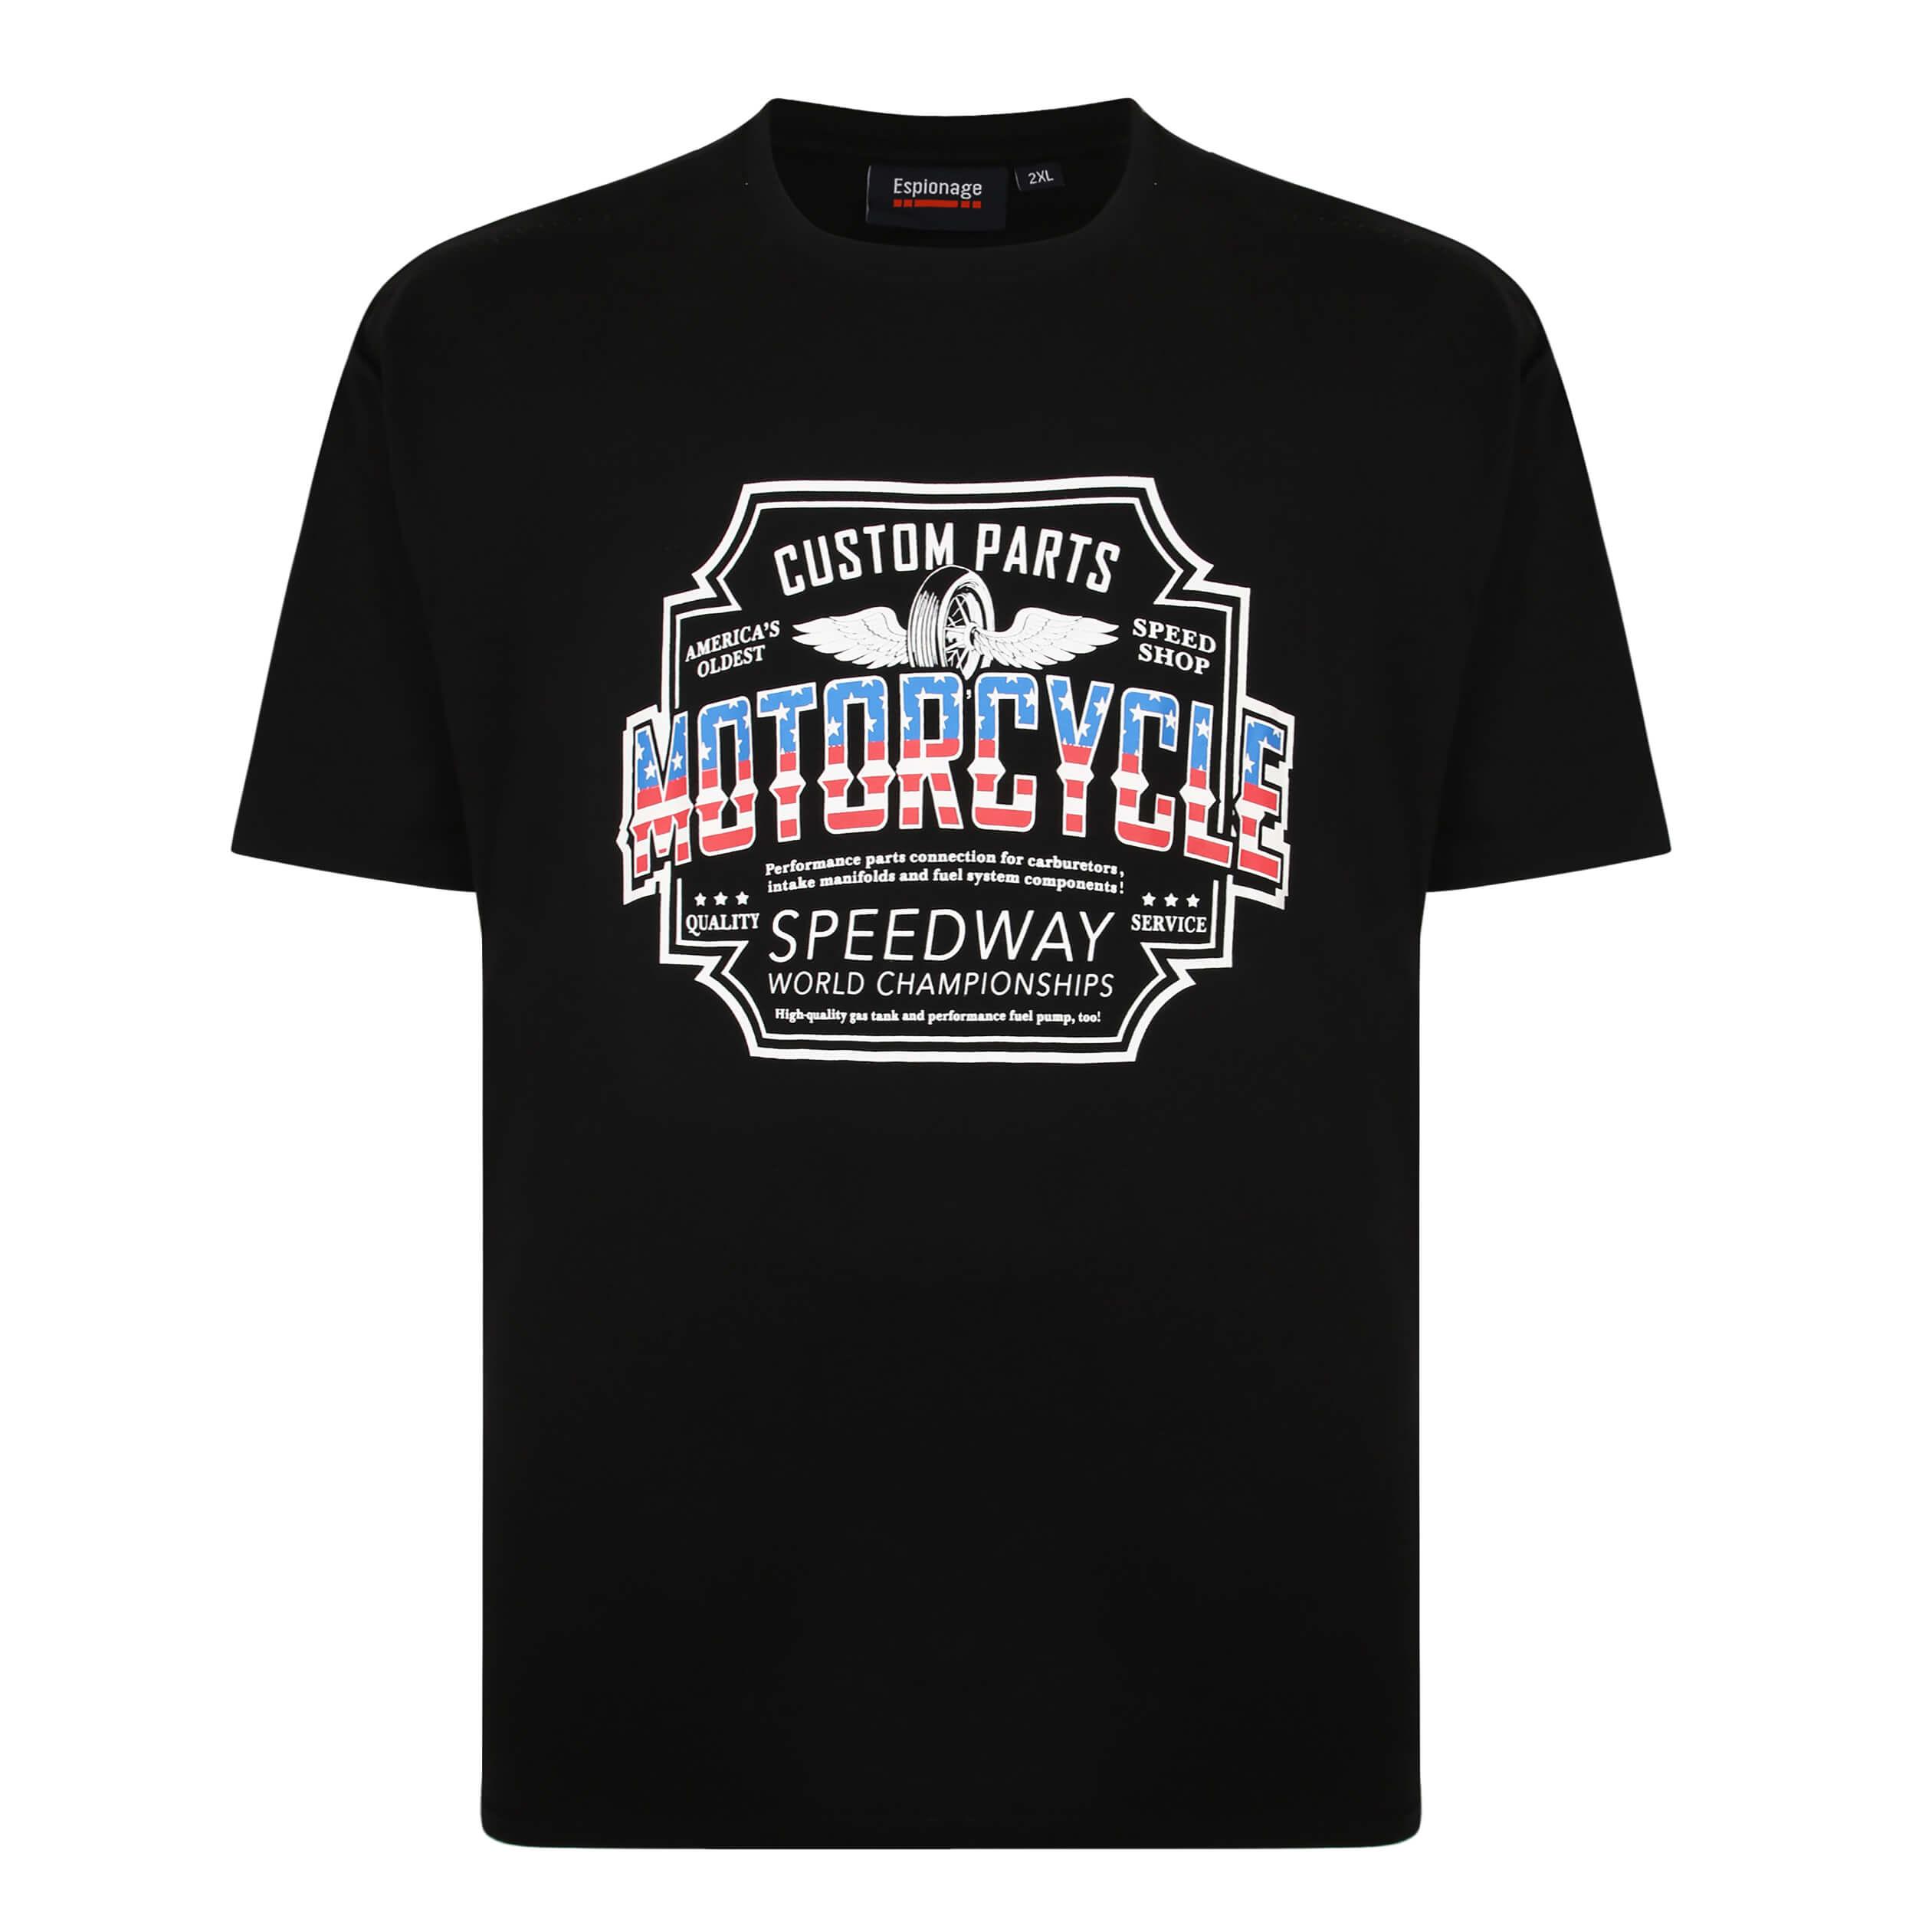 Espionage Motorcycle Print Tee Shirt